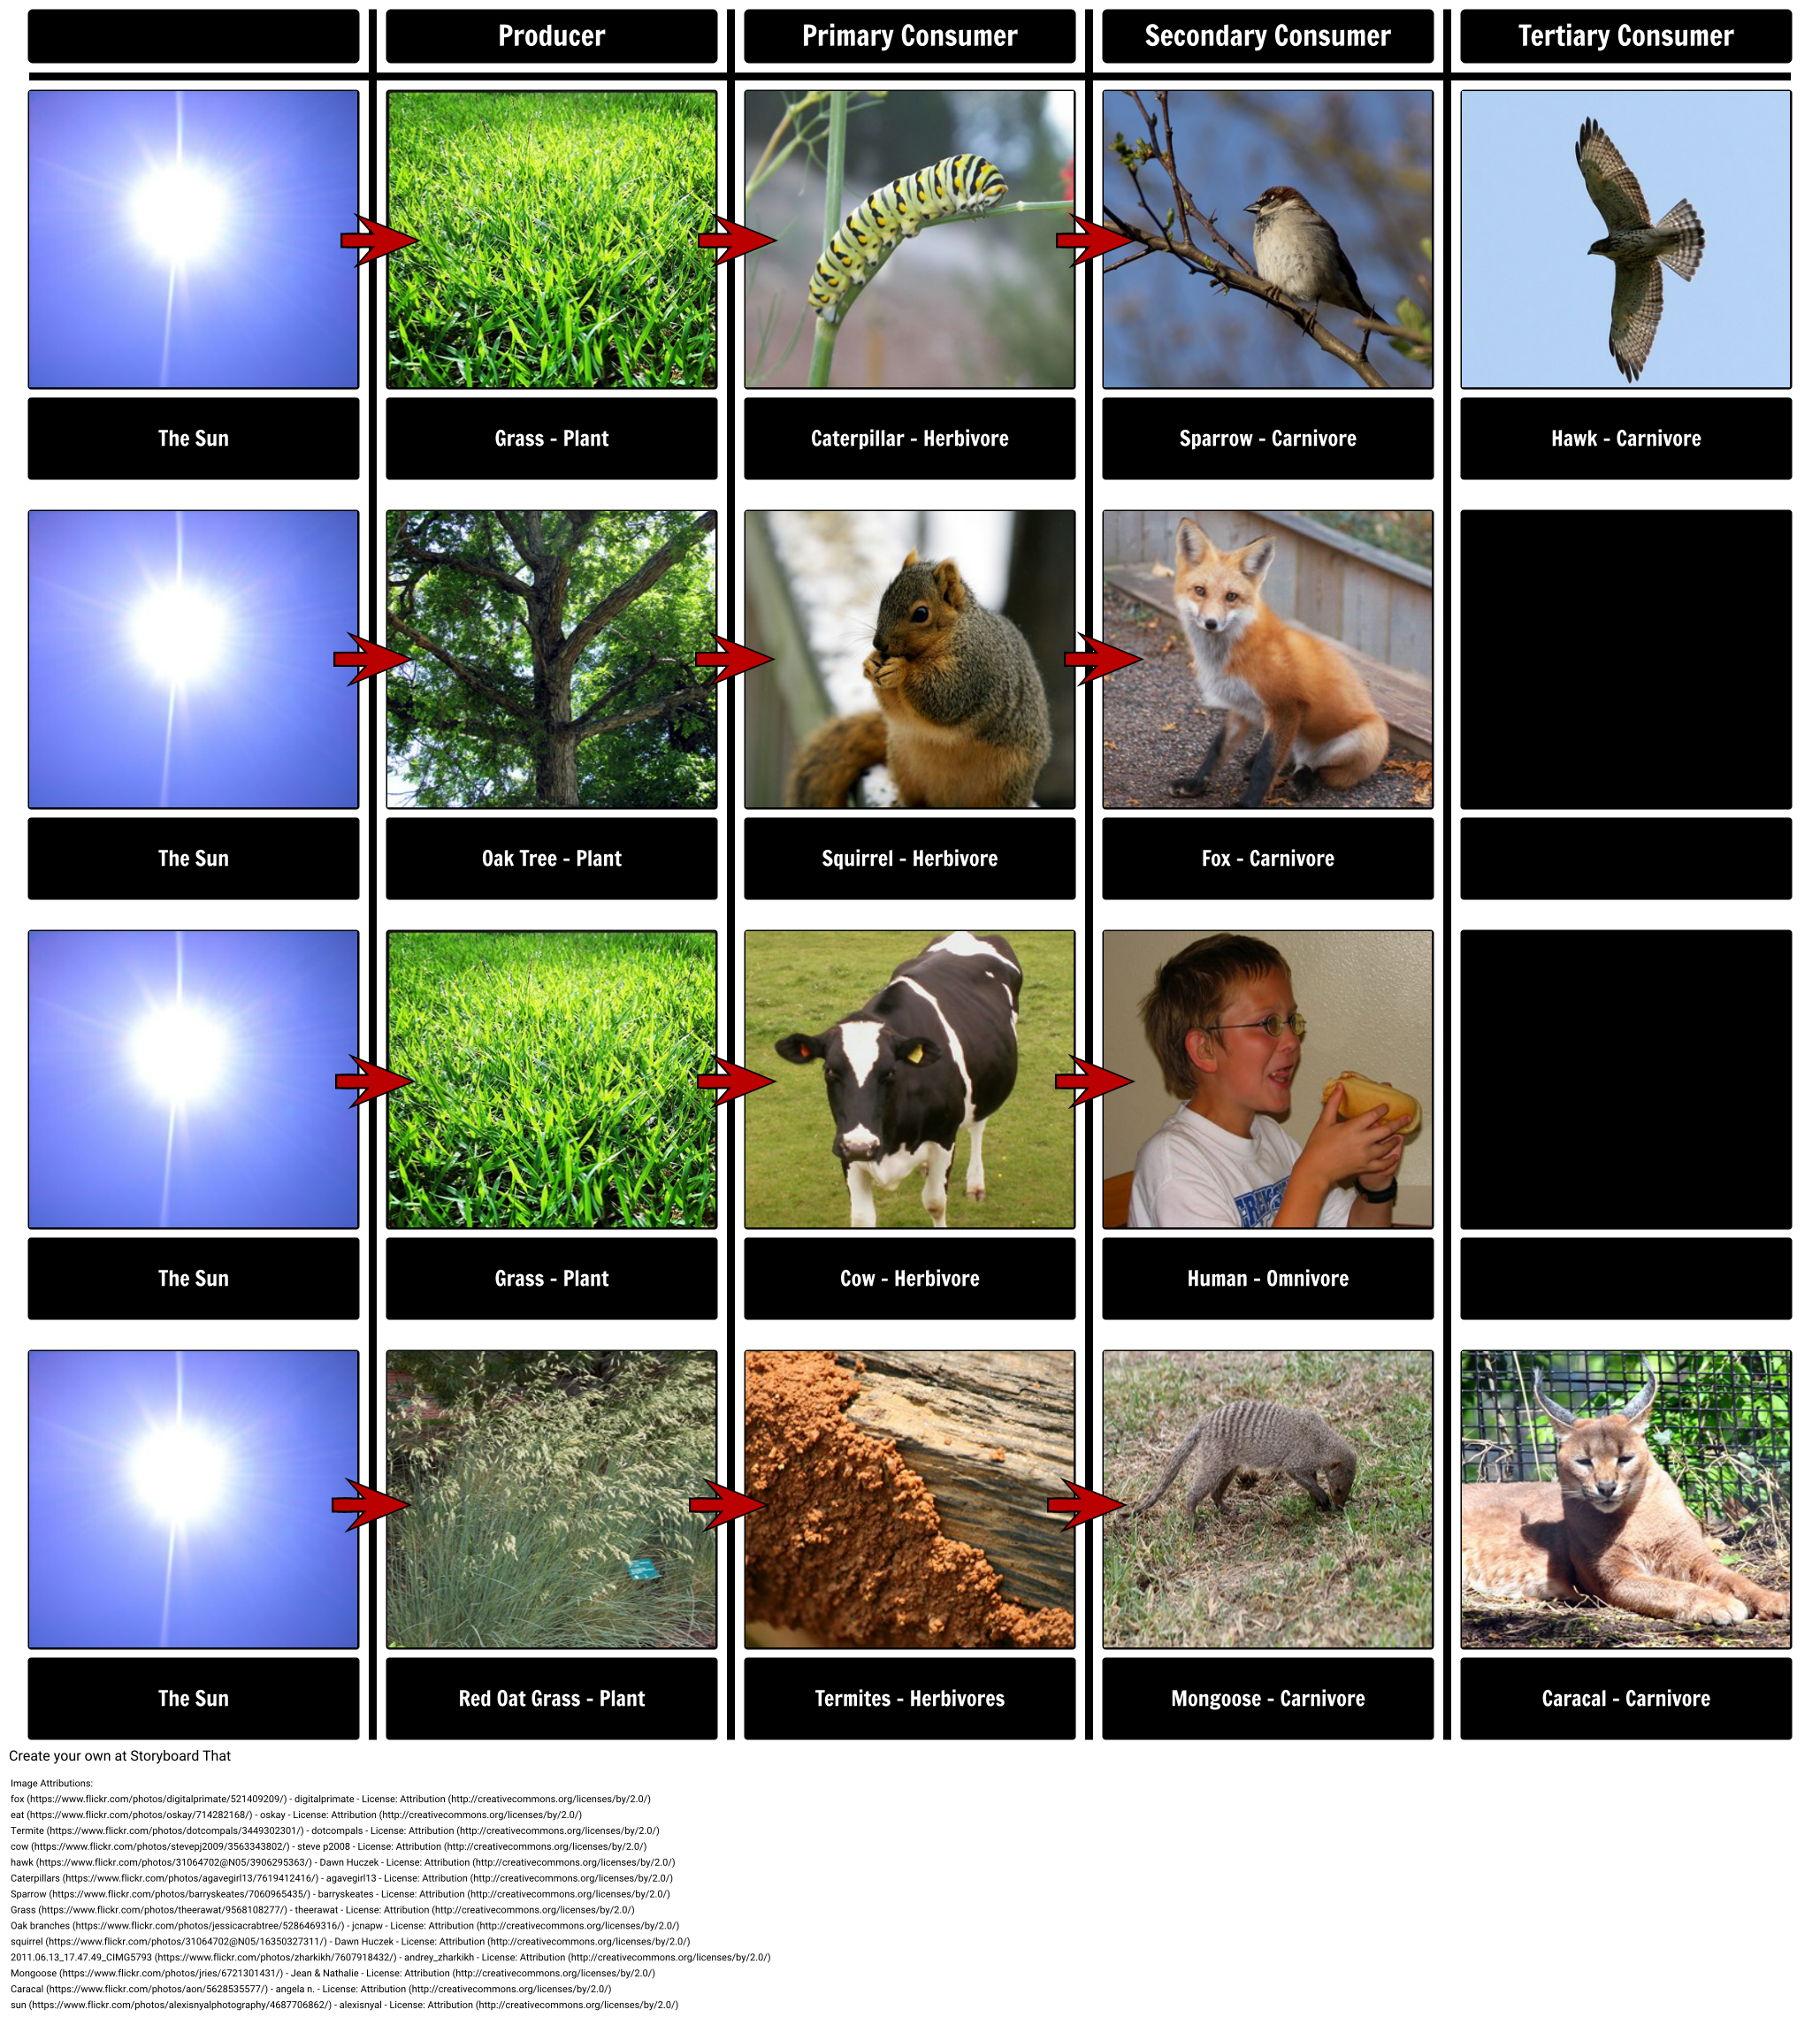 food chain  u0026 food web examples  definition  u0026 activities